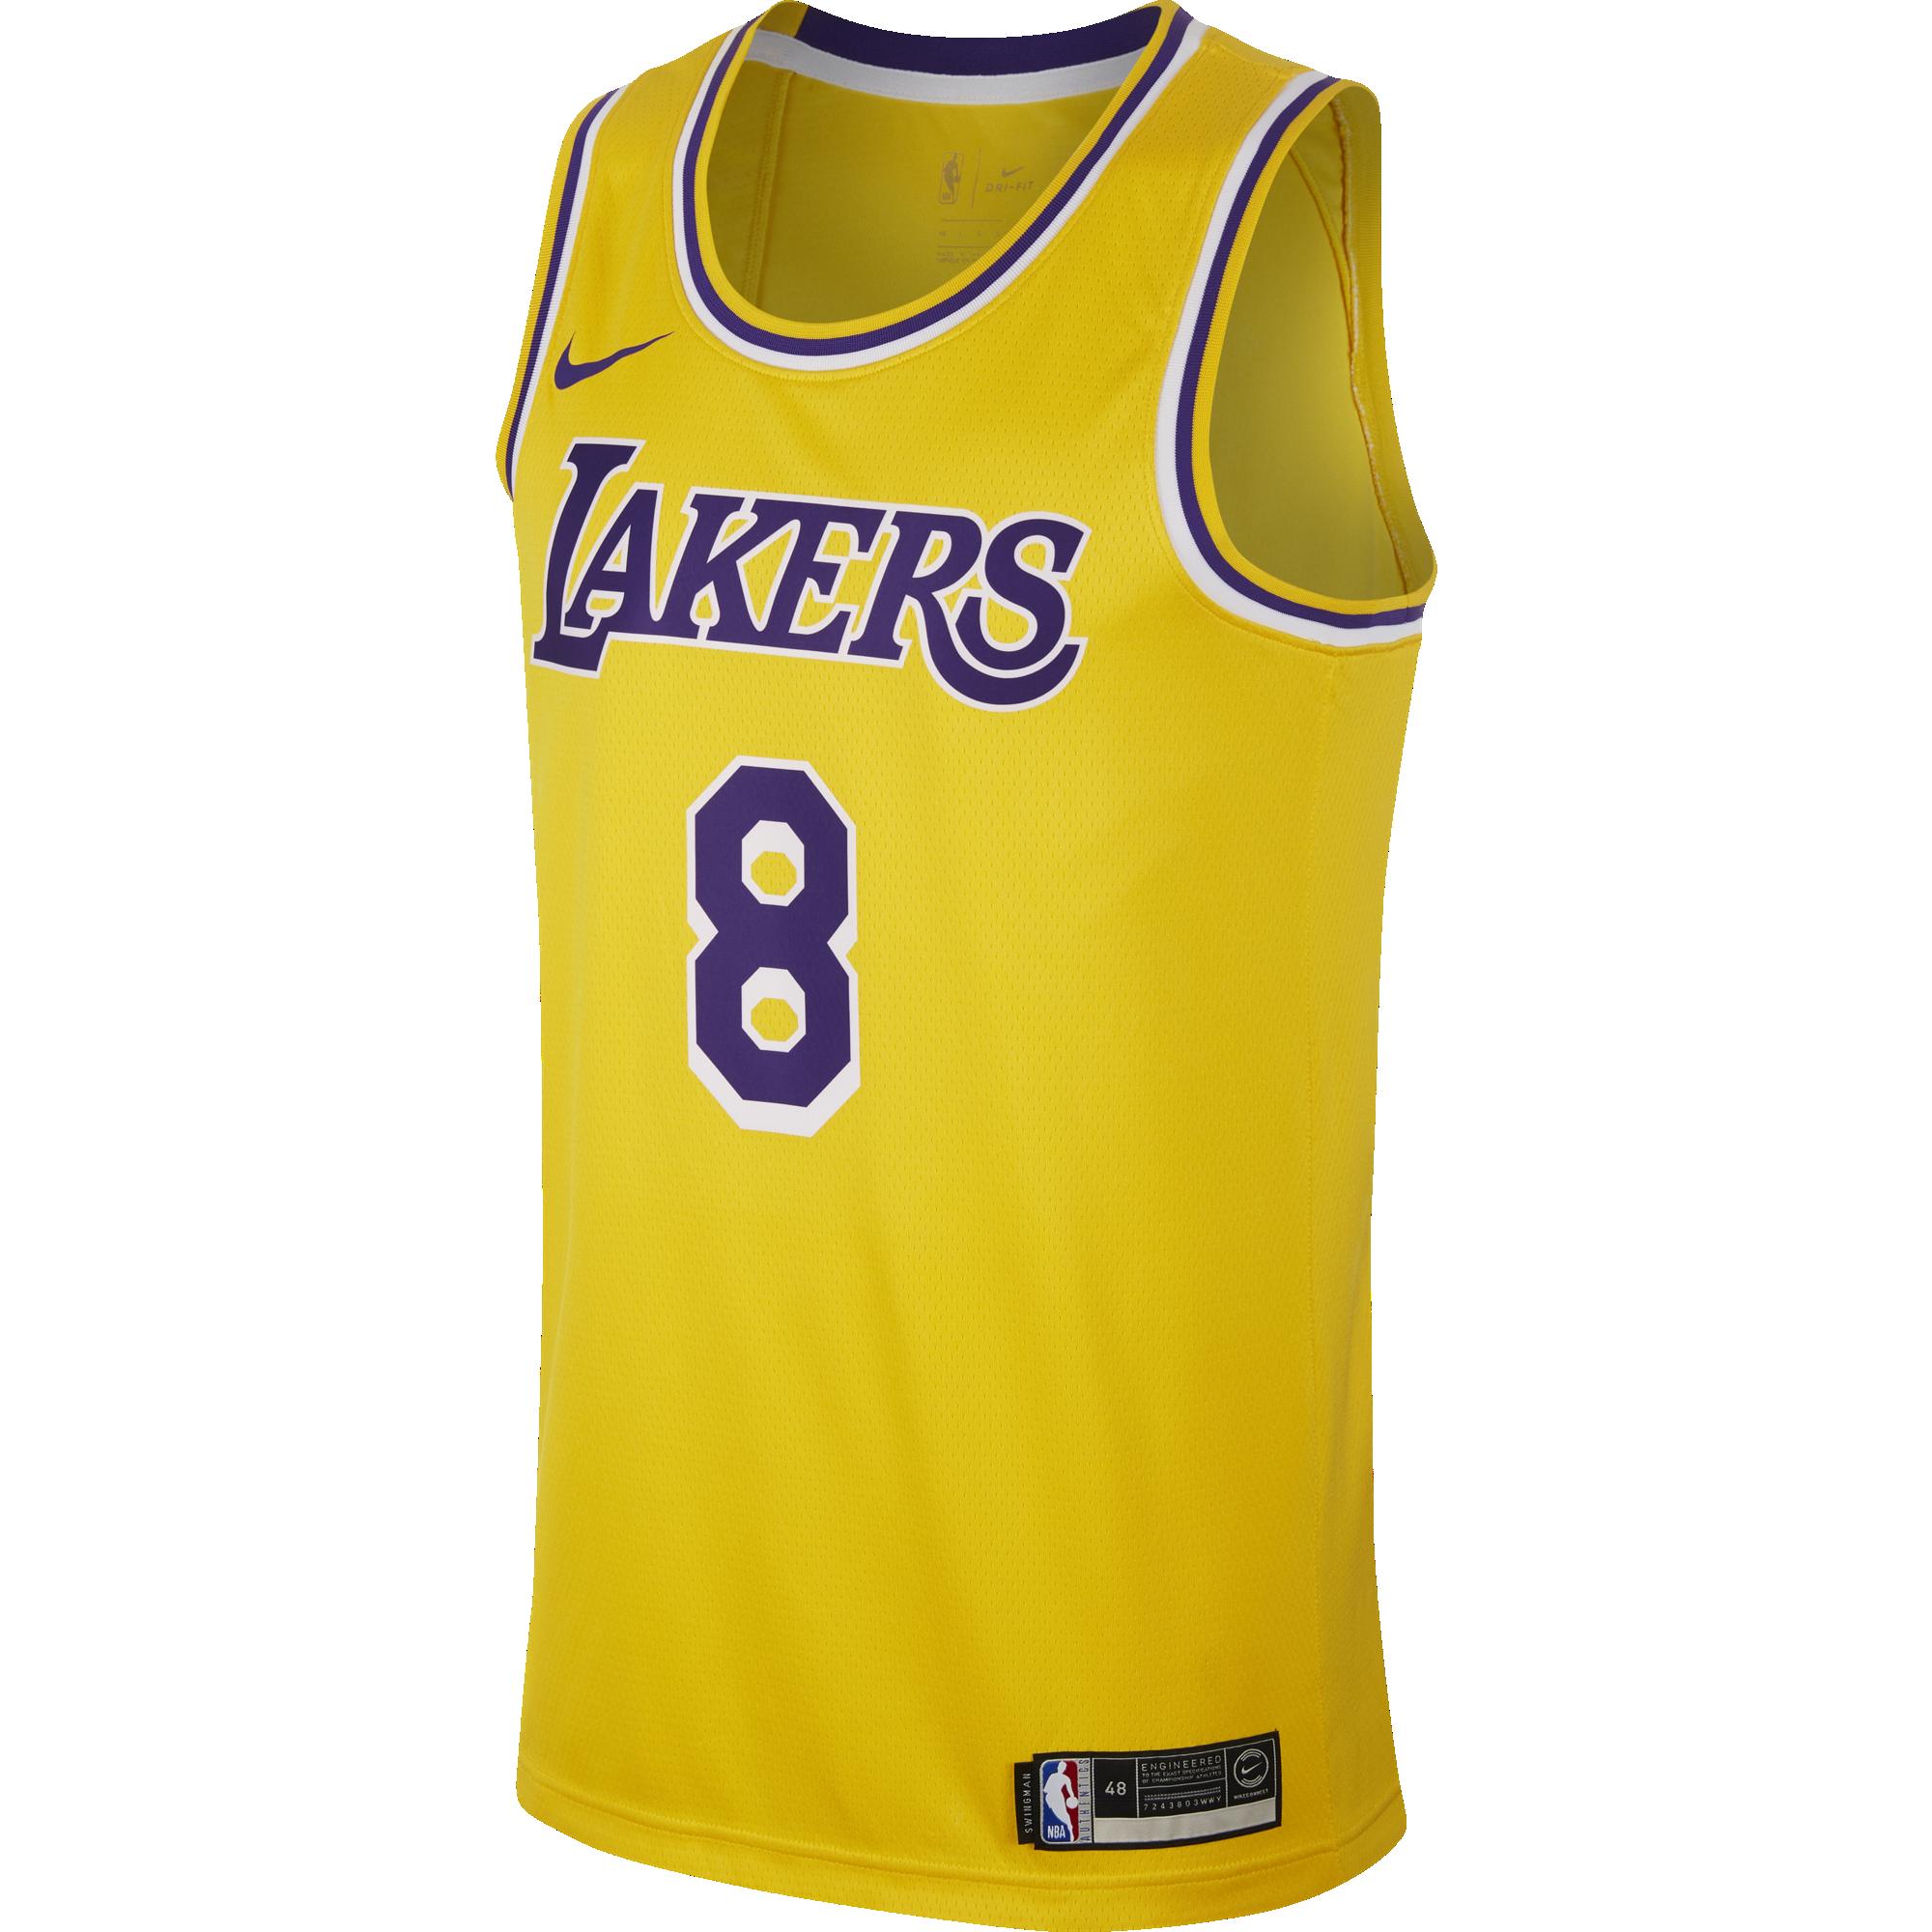 NIKE NBA LOS ANGELES LAKERS KOBE BRYANT SWINGMAN ROAD JERSEY